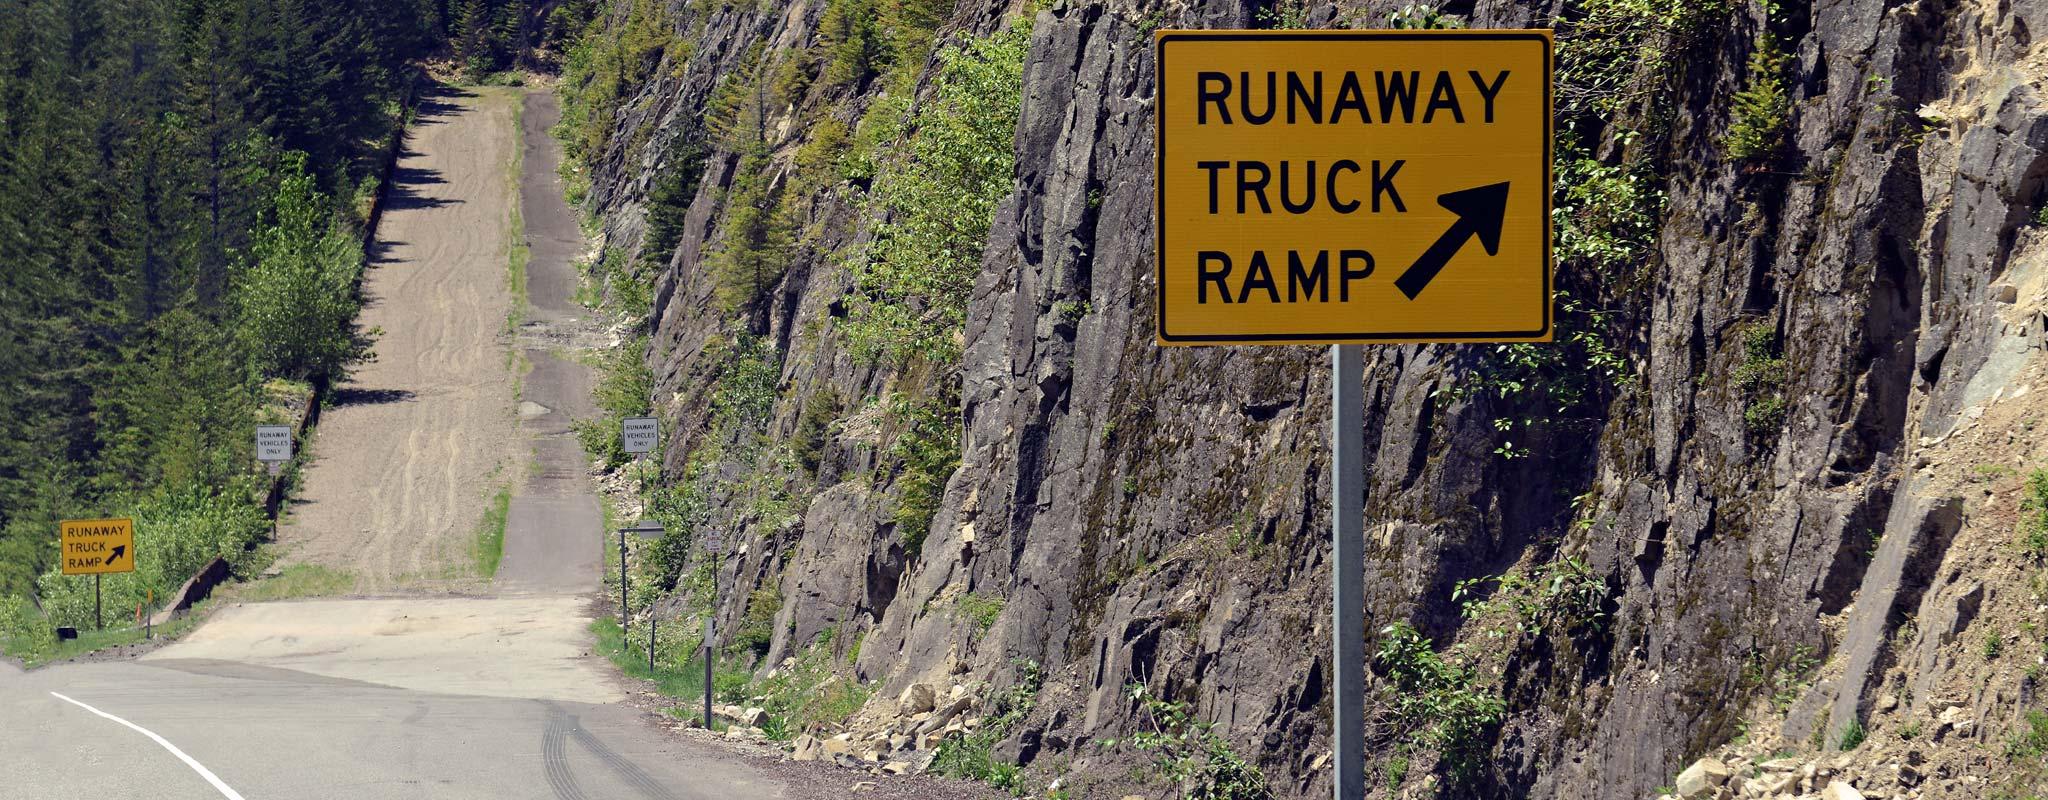 Runaway truck ramp.